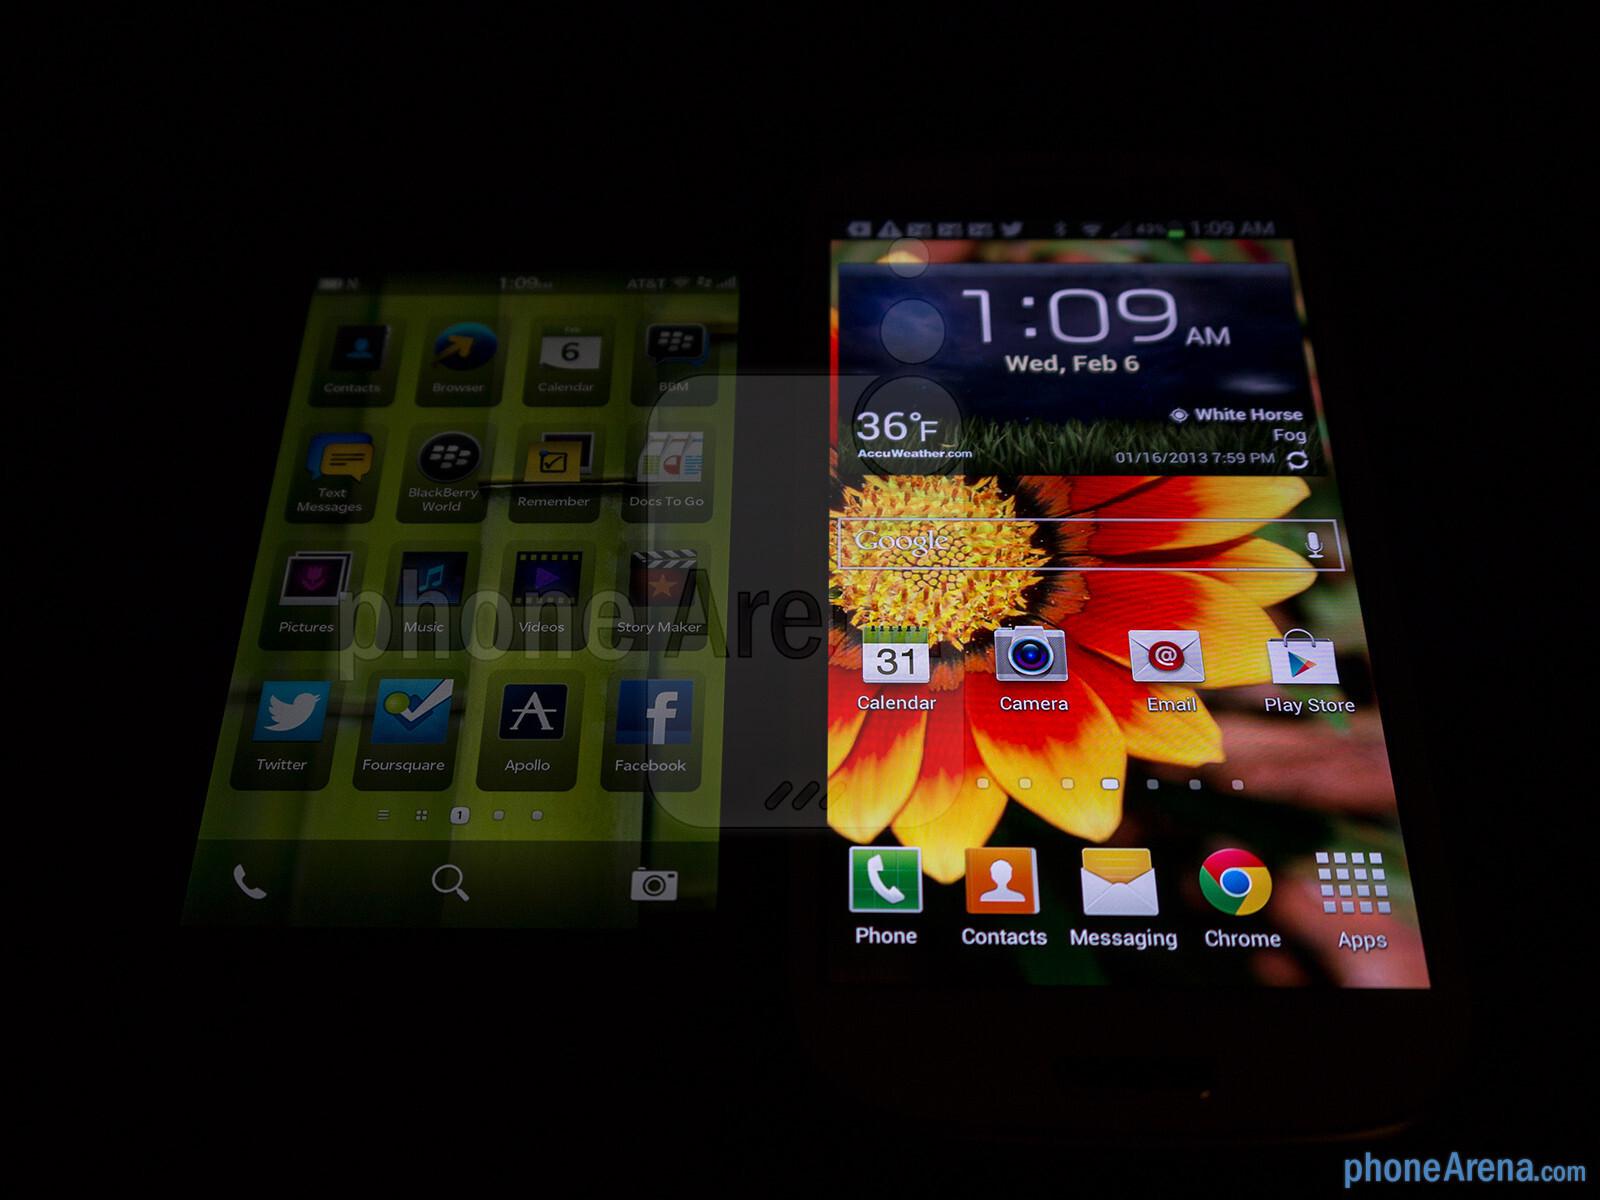 BlackBerry Z10 vs Samsung Galaxy S III - PhoneArena